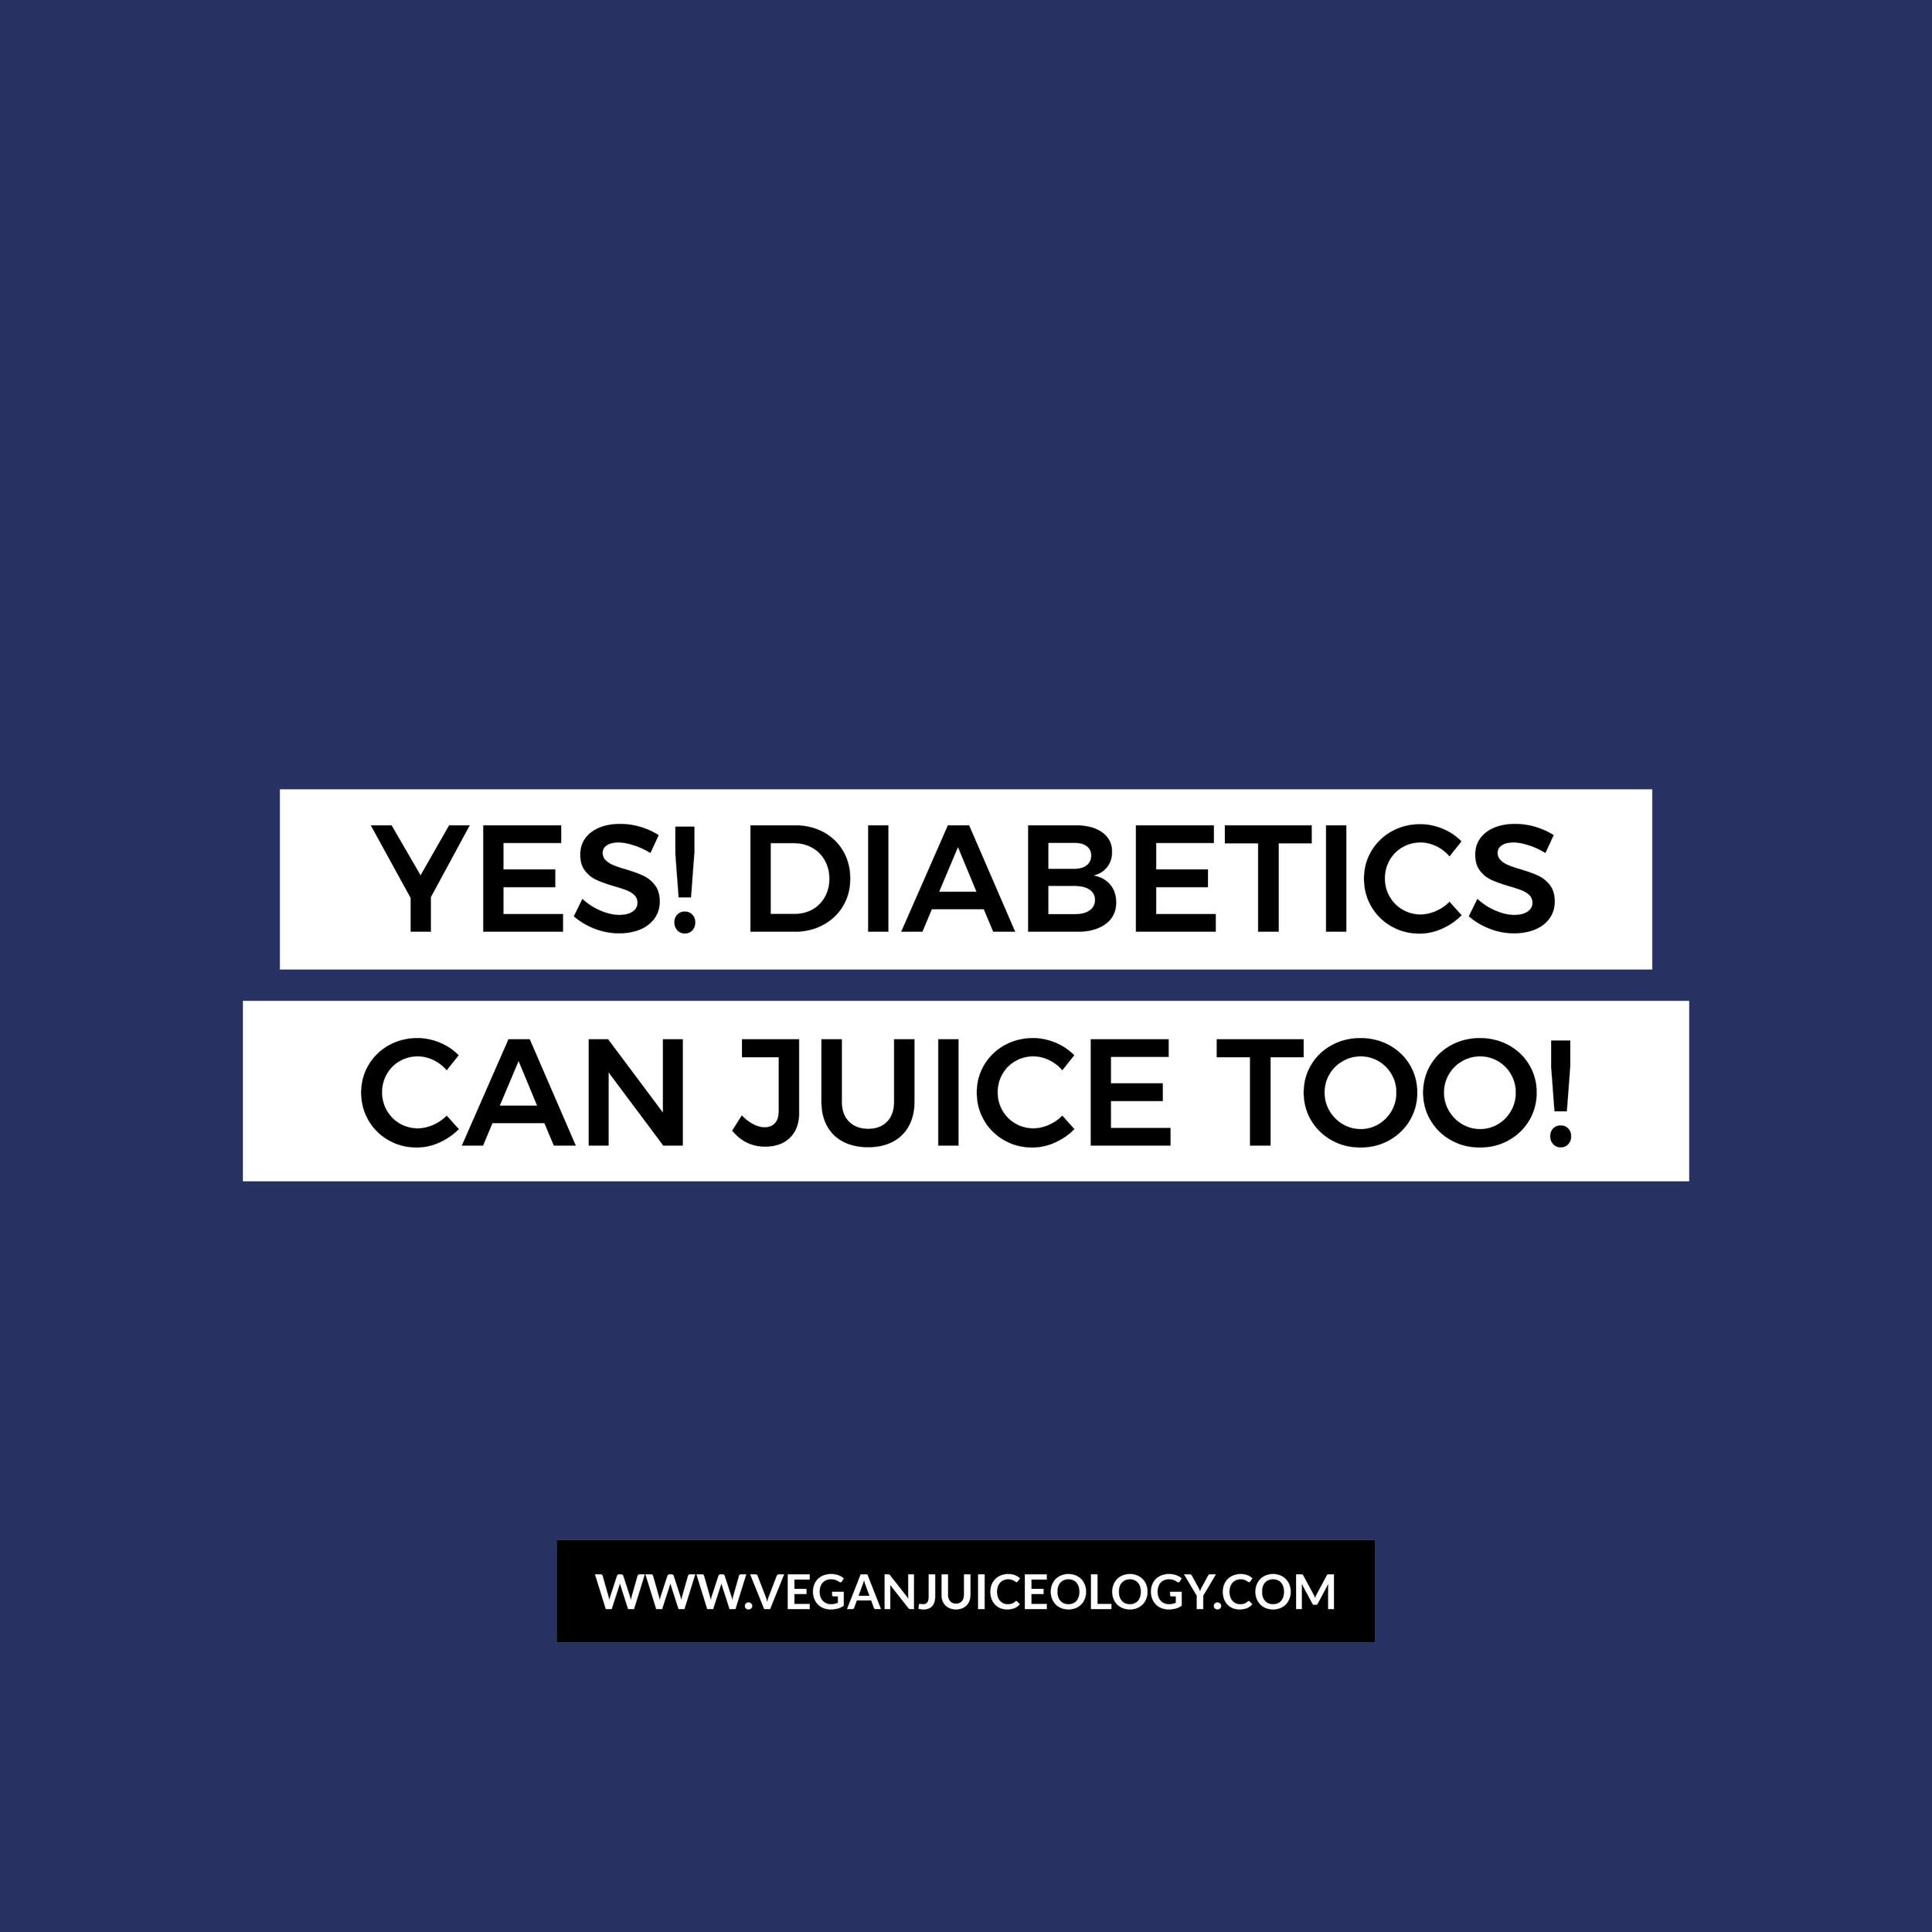 diabetics_can_juice.png